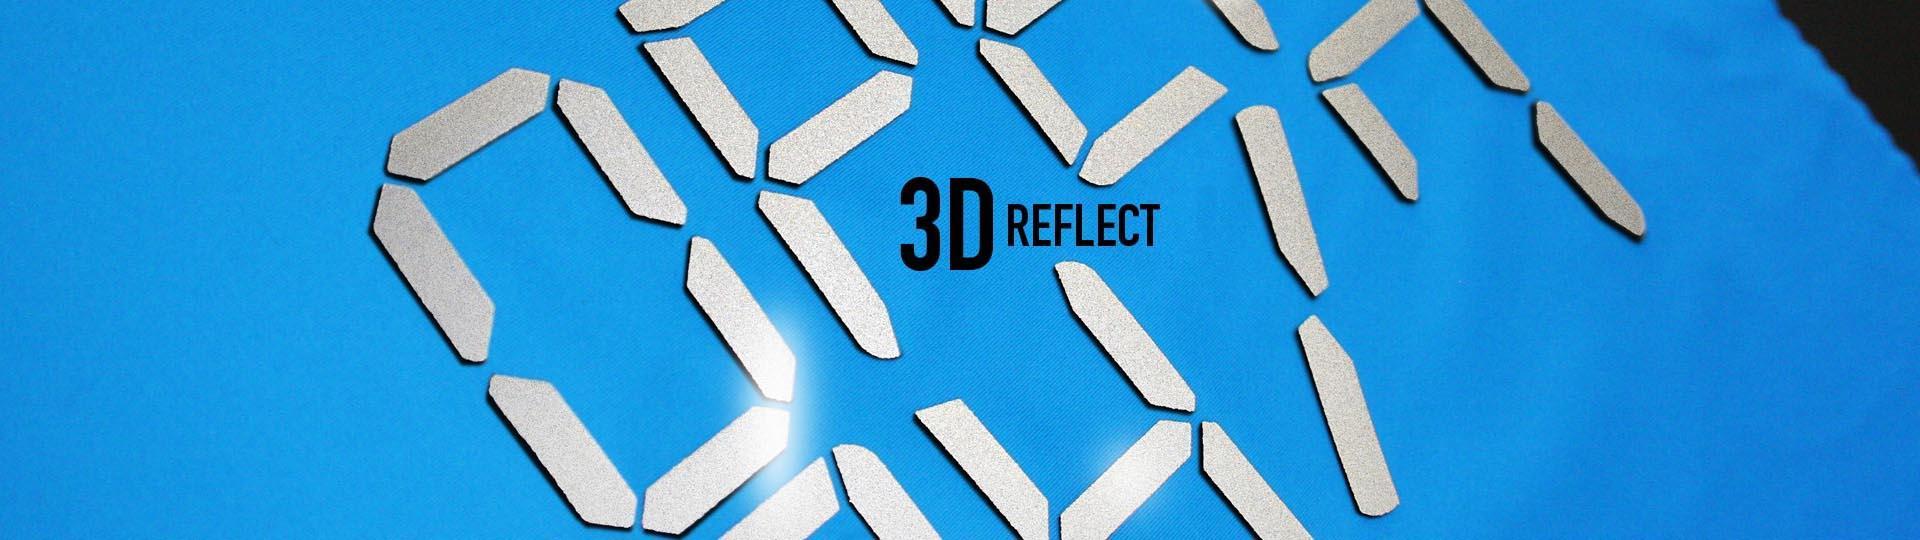 3D TRANSFER - image 5